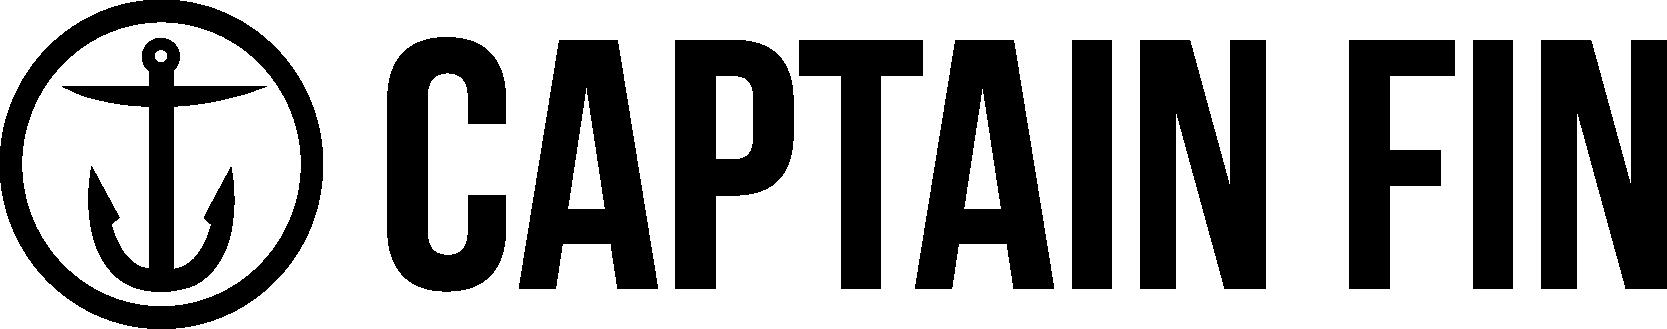 1657ee6289589 captain-fin-co-2 myshopify com logo.png